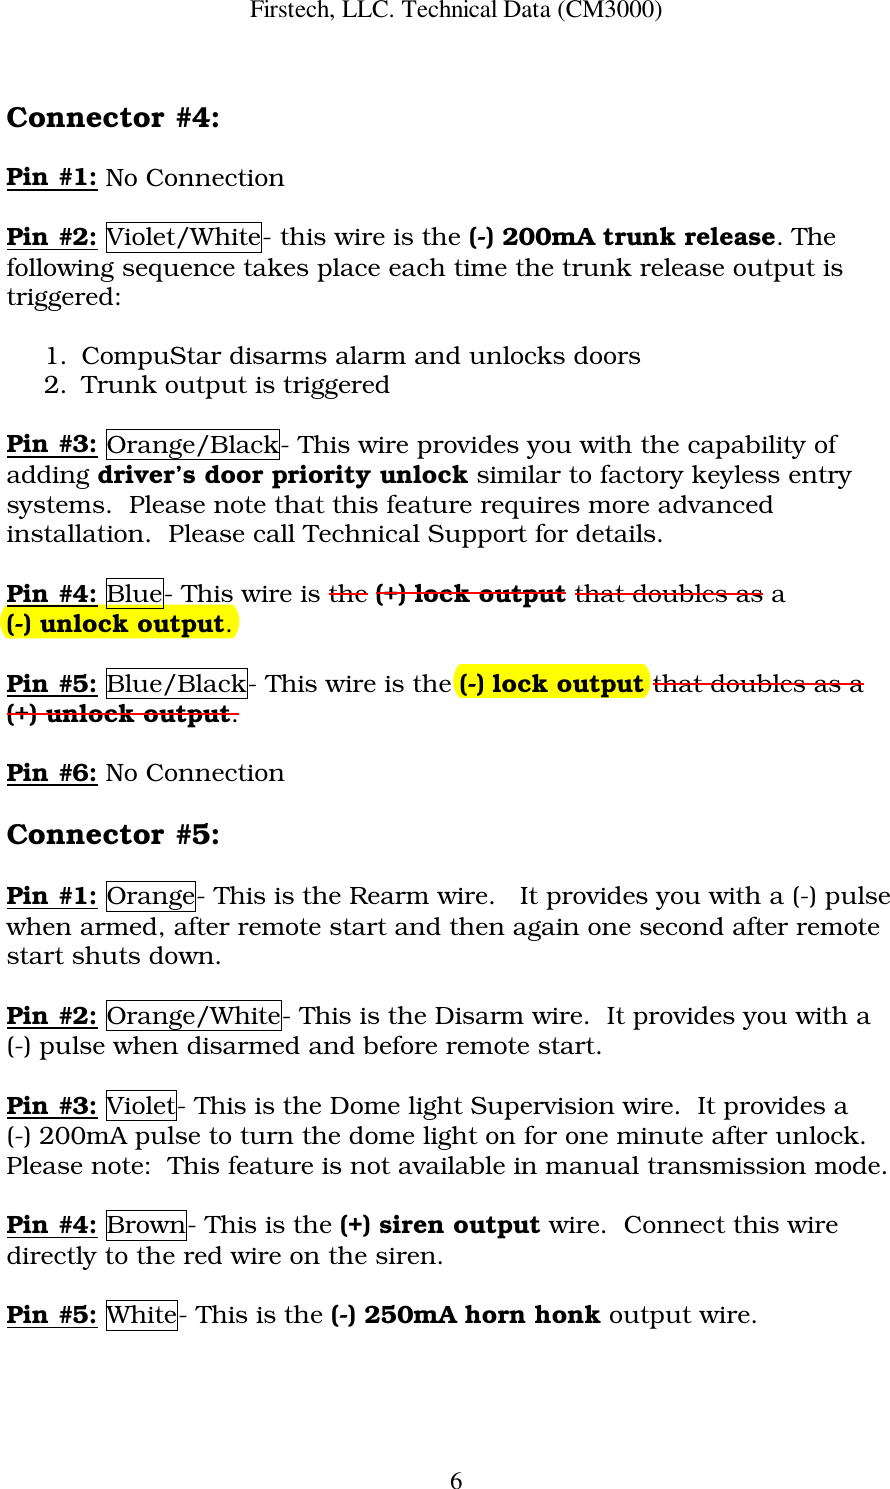 Perfect Dv7 Pk40000 6 Pines Sketch - Electrical System Block Diagram ...